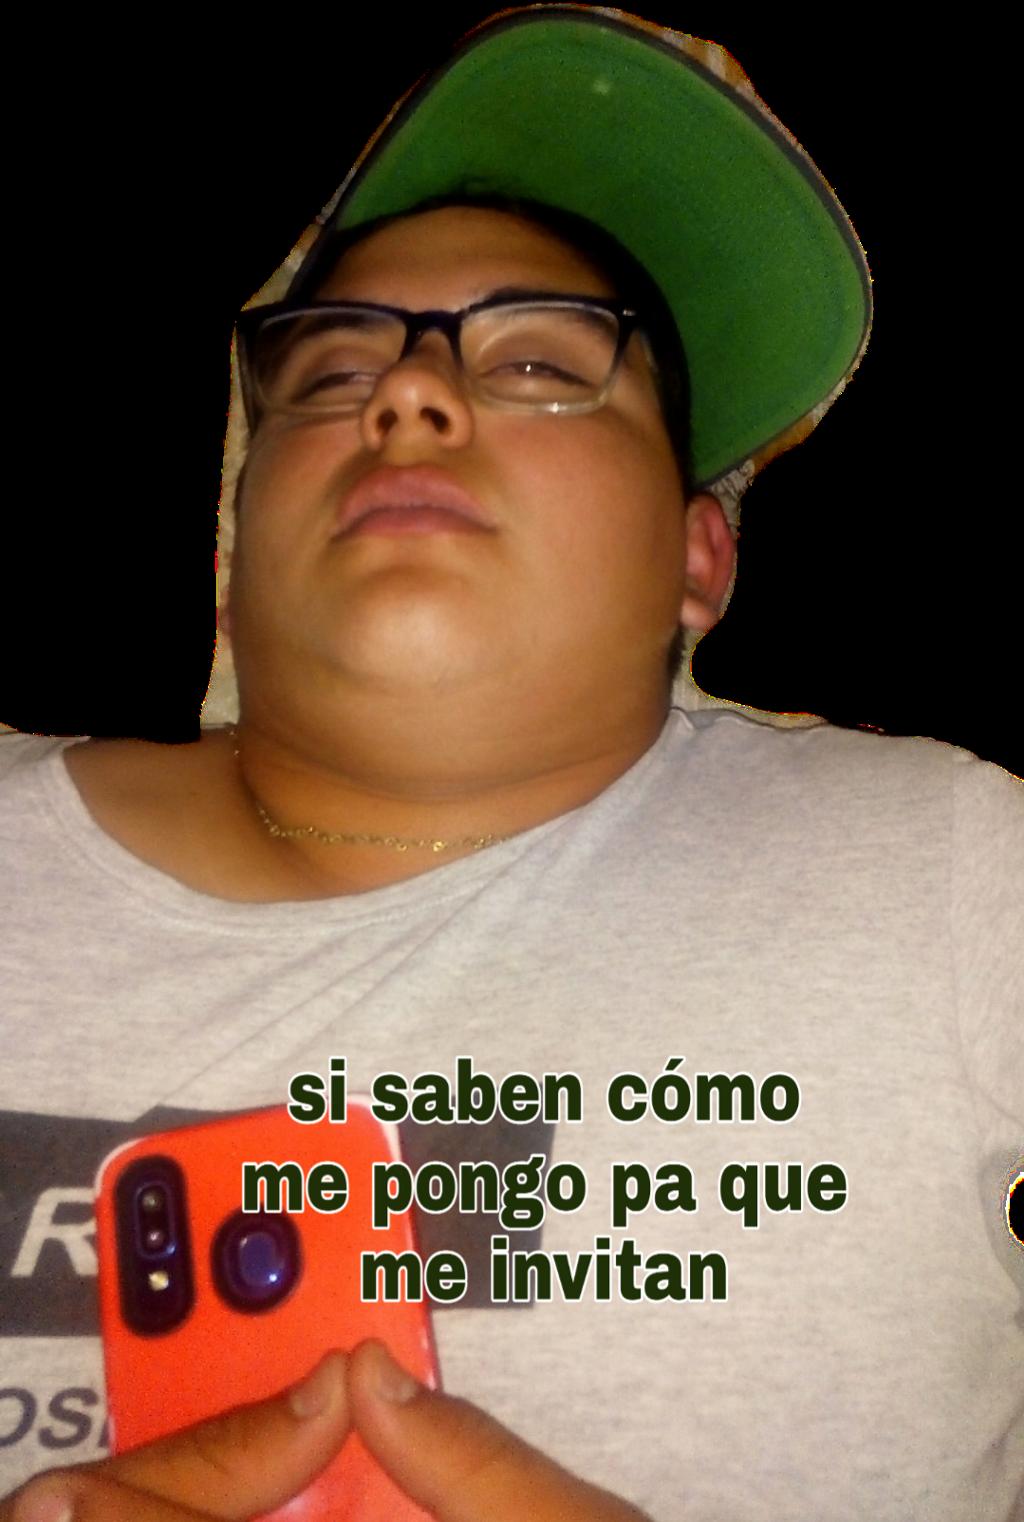 #bengoa